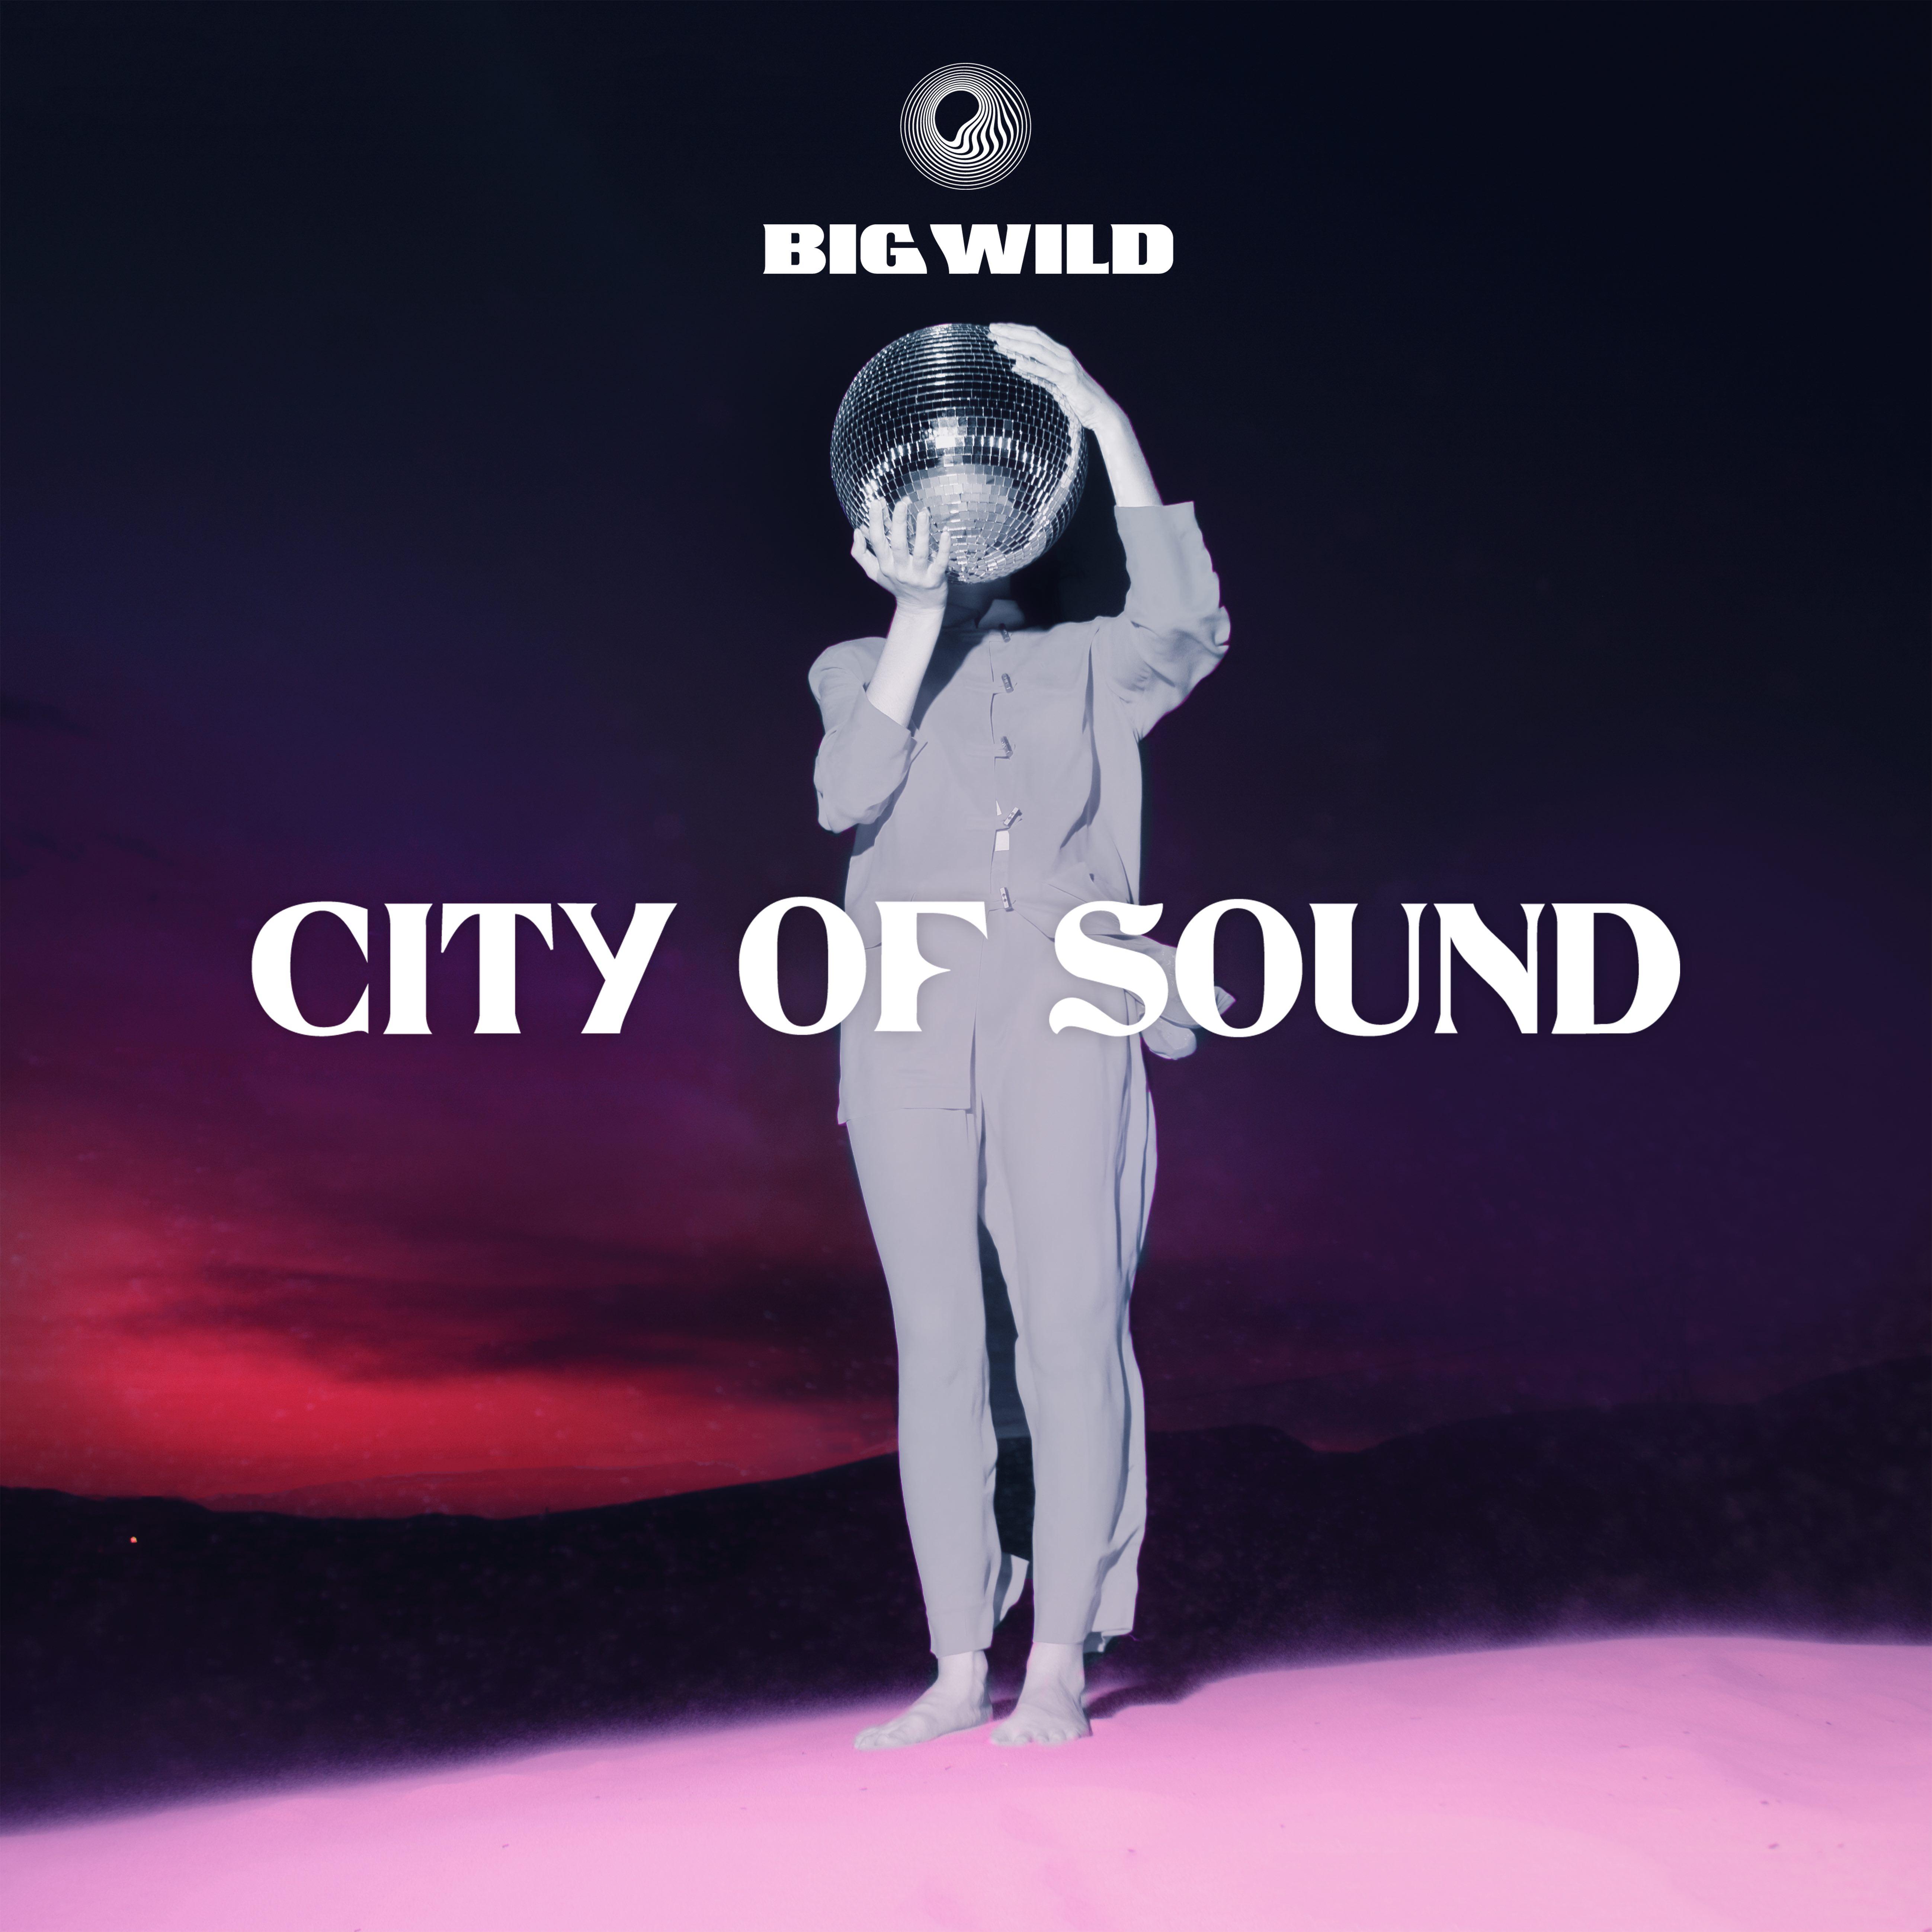 city_of_sound_main_album_art_final33.jpg